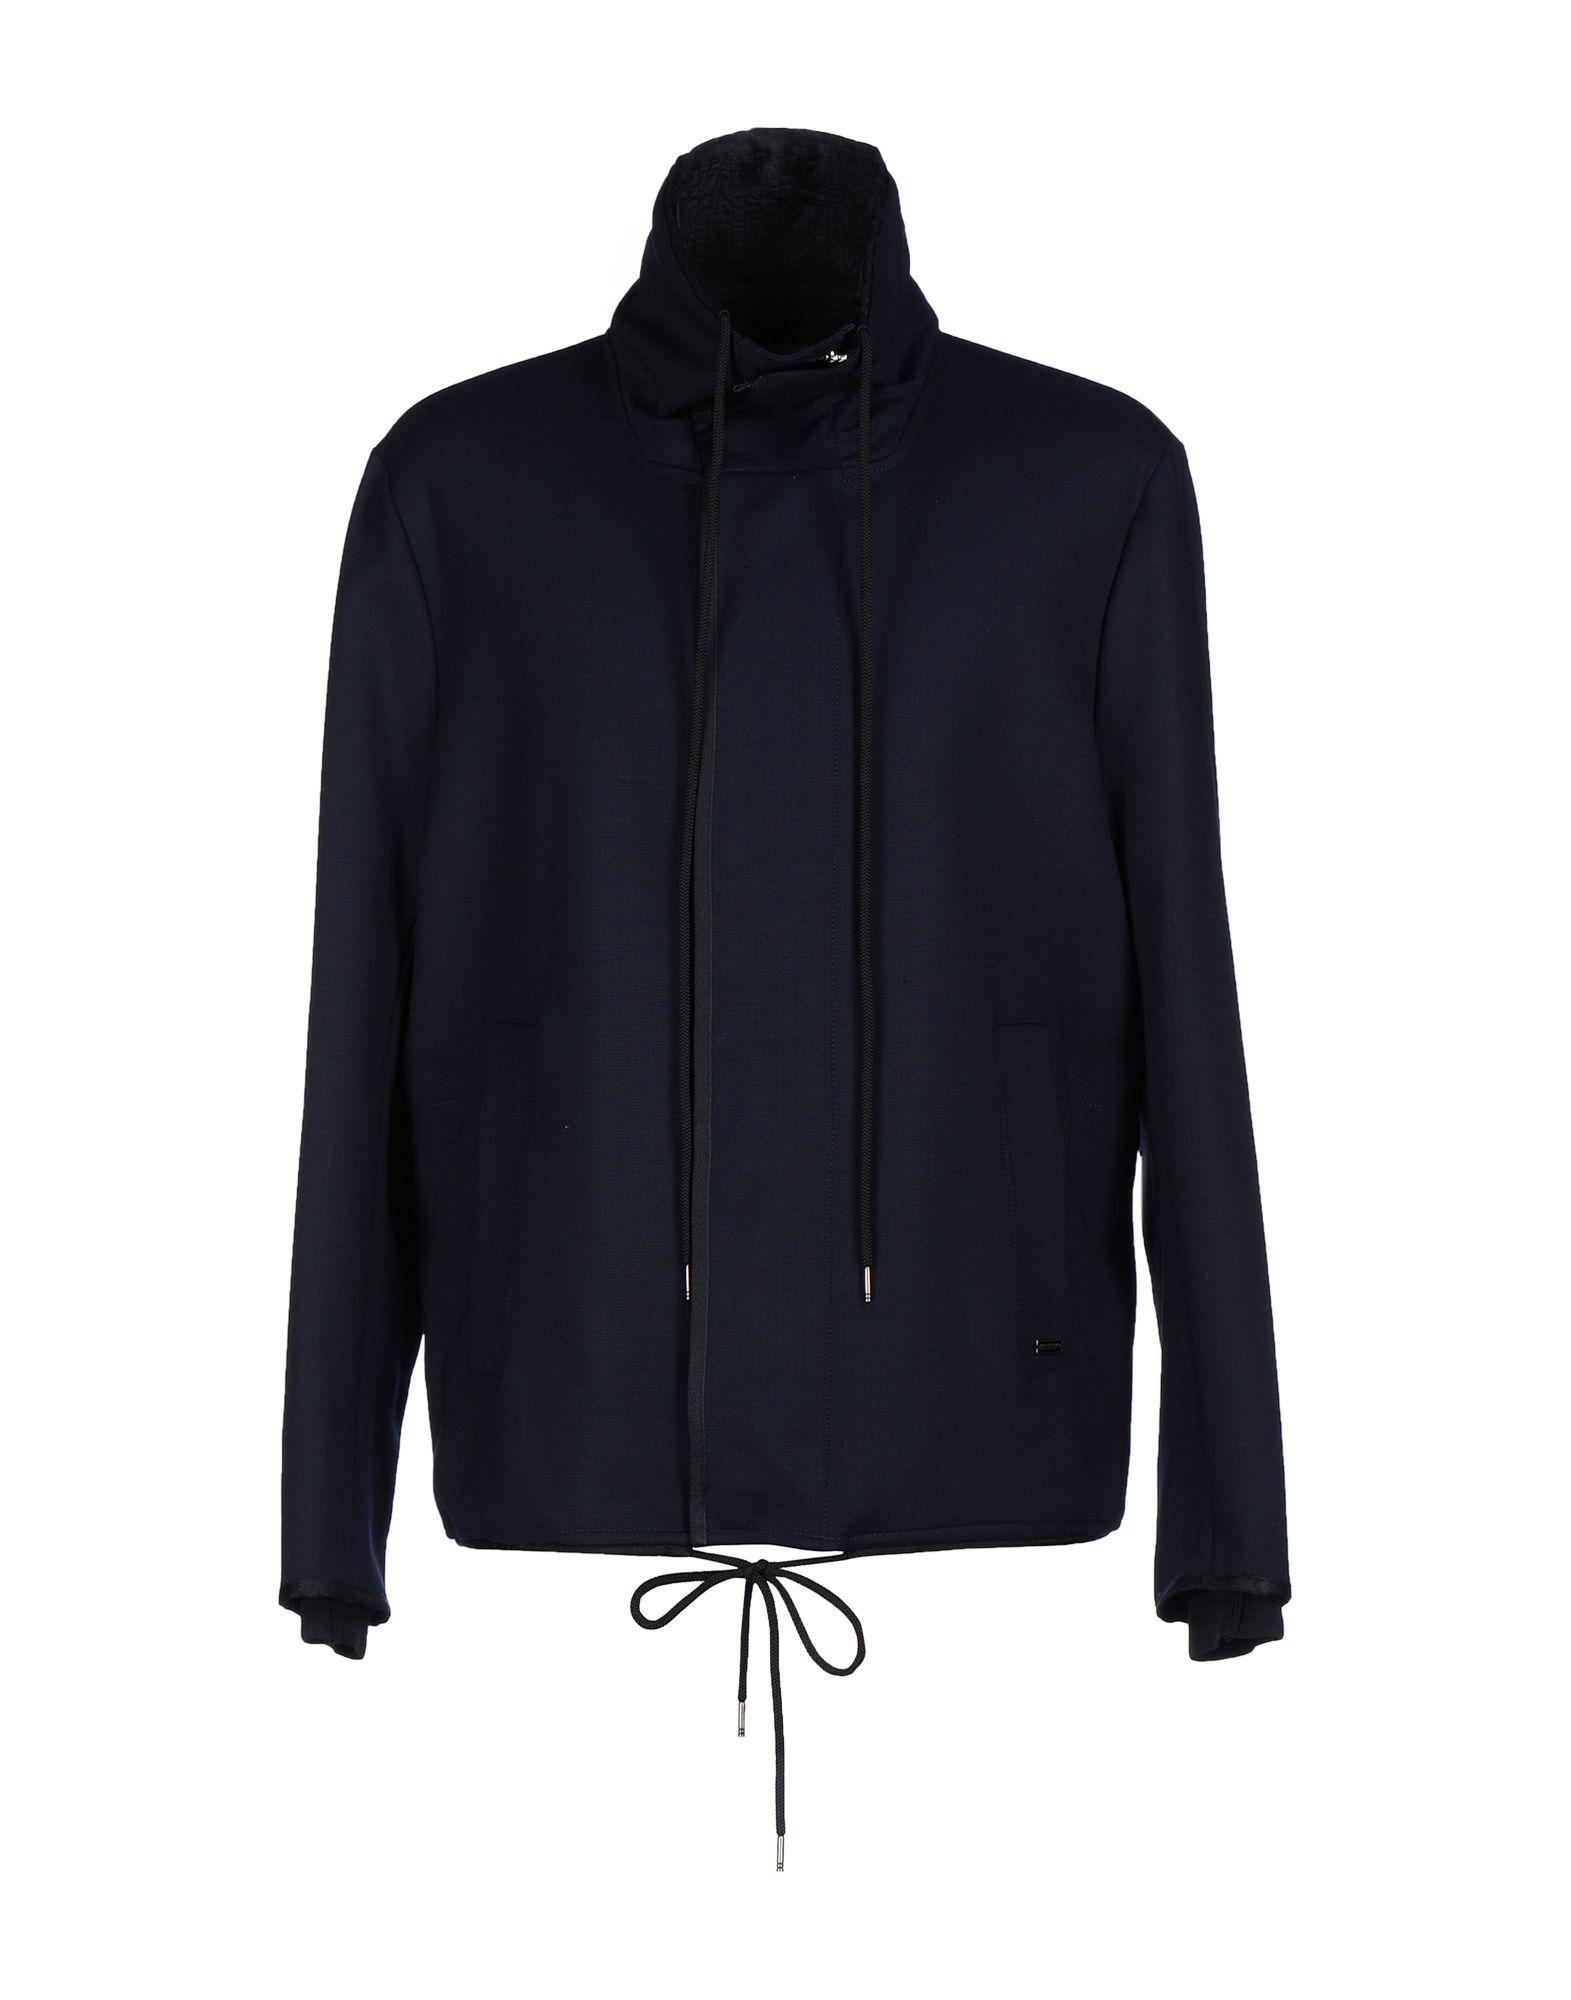 DIRK BIKKEMBERGS Куртка dirk bikkembergs куртка из синей перфорированной кожи